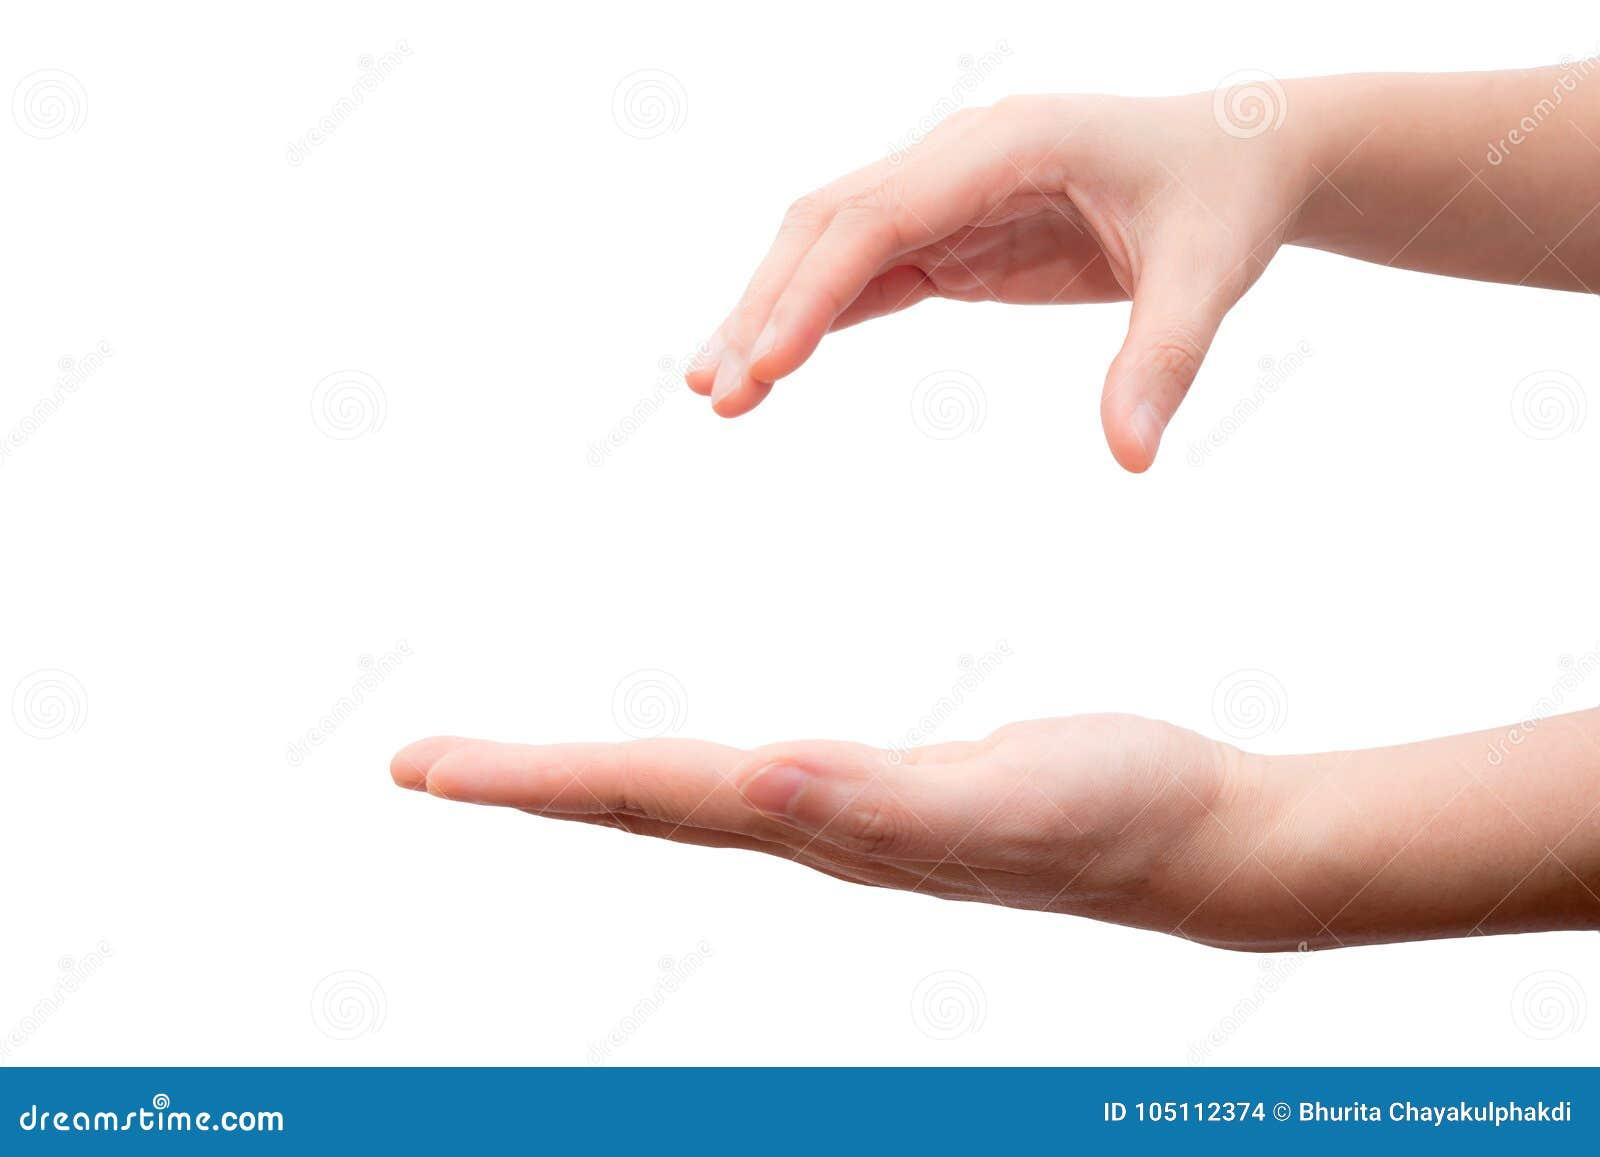 Hand holding and catching something isolated on white background.